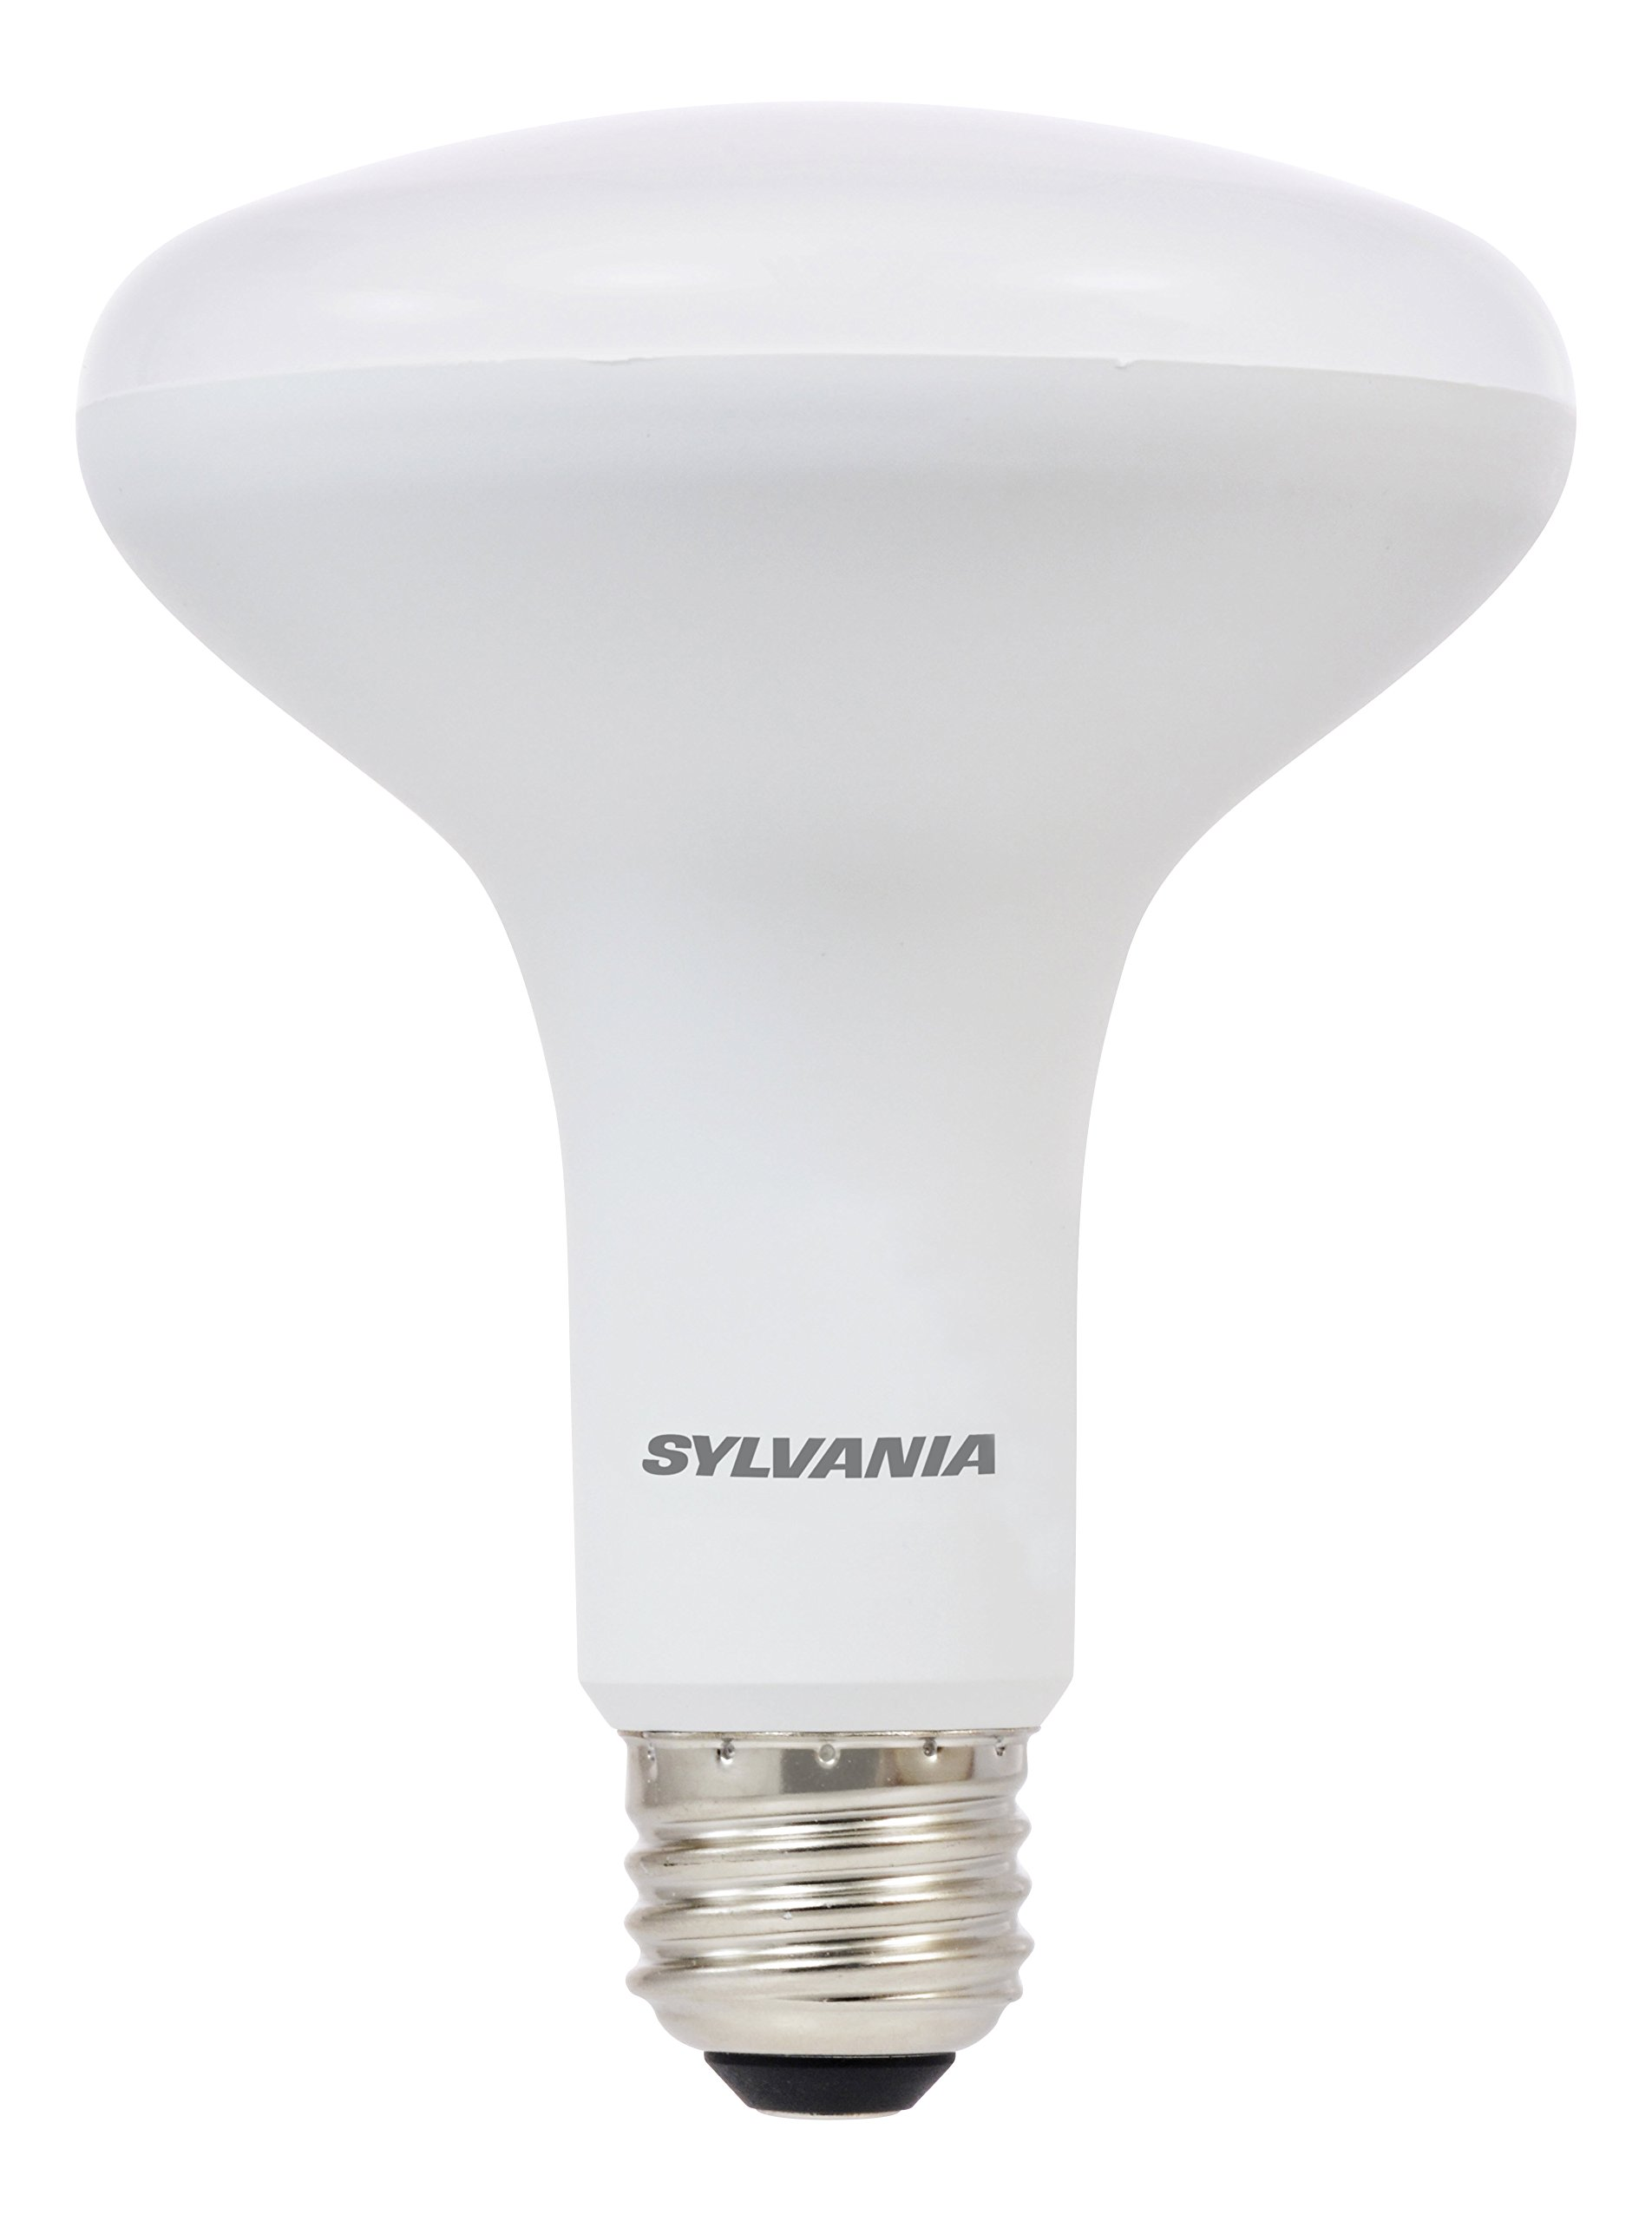 Led Light Bulb Daylight: SYLVANIA, 65W Equivalent, LED Light Bulb, BR30 Lamp, 2